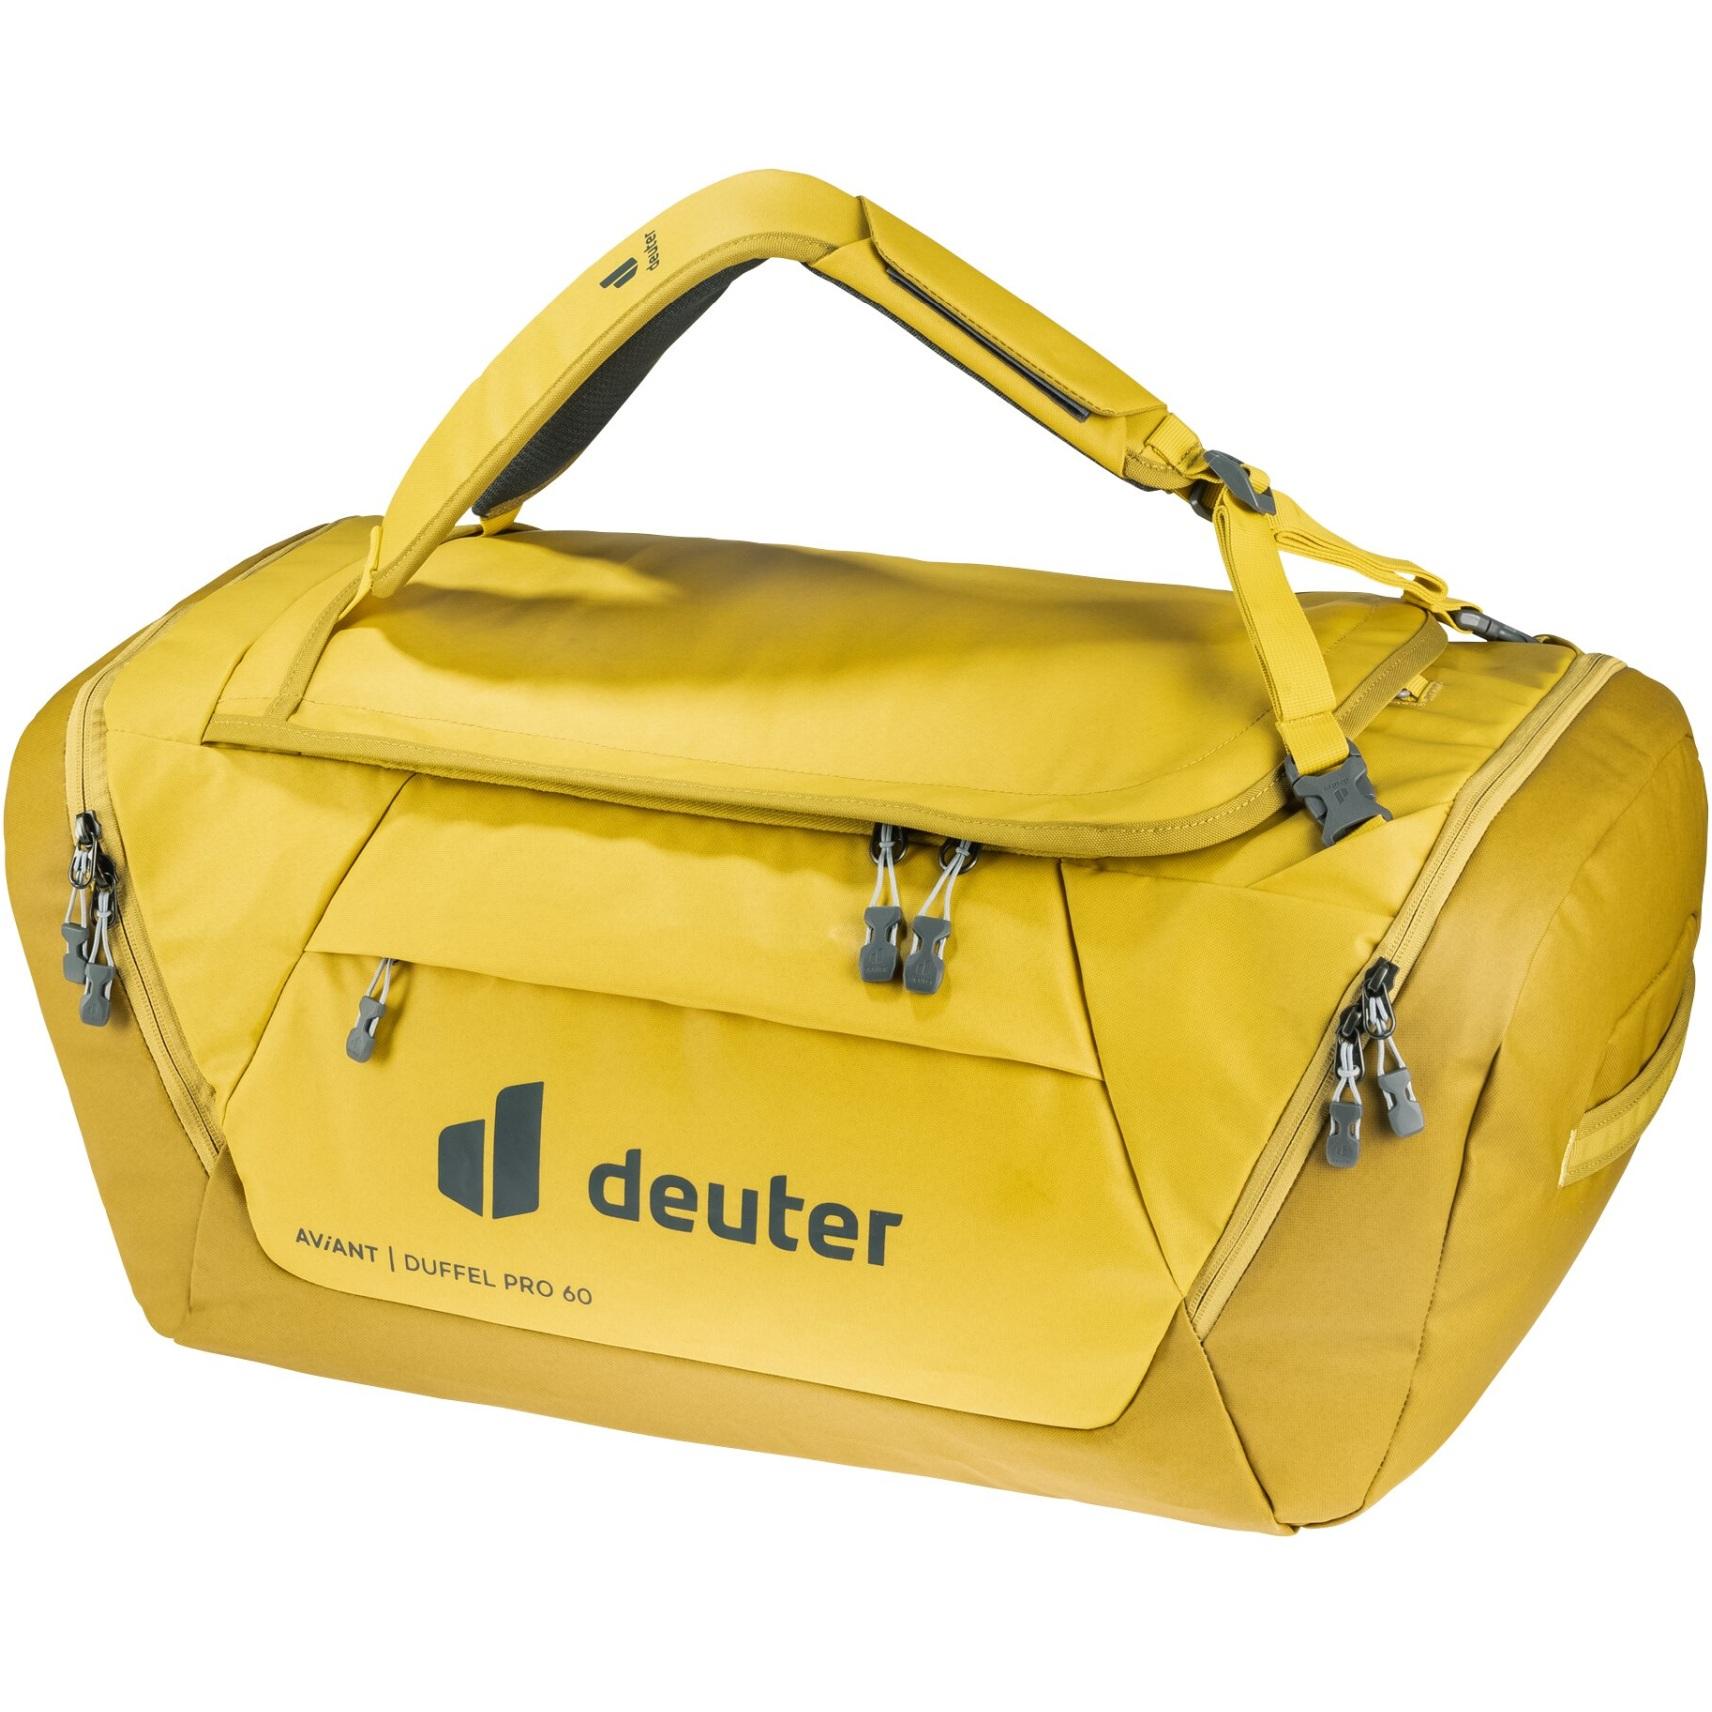 Produktbild von Deuter AViANT Duffel Pro 60 Tasche - corn-turmeric